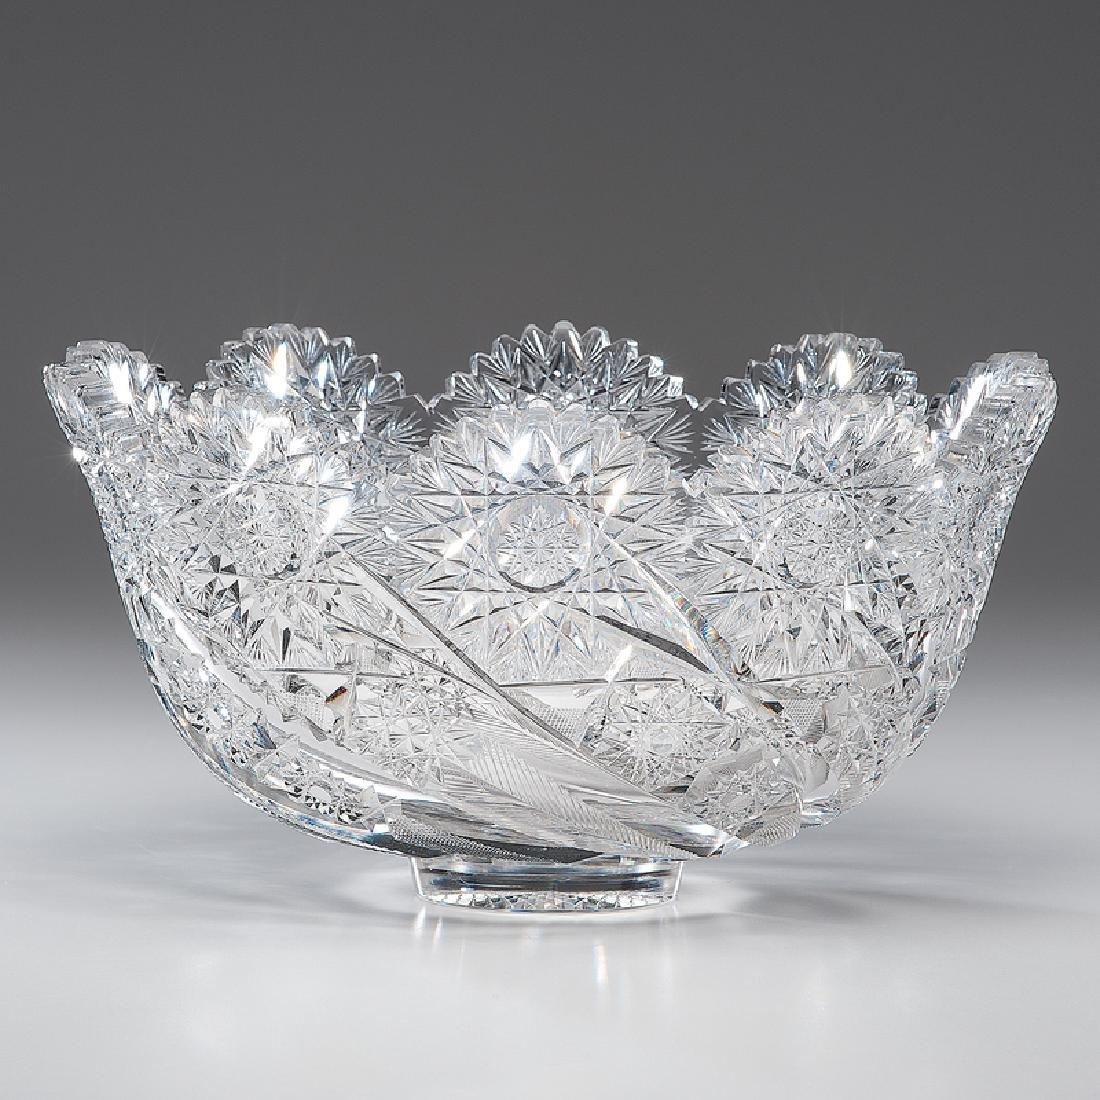 Libbey Brilliant Cut Glass Punch Bowl